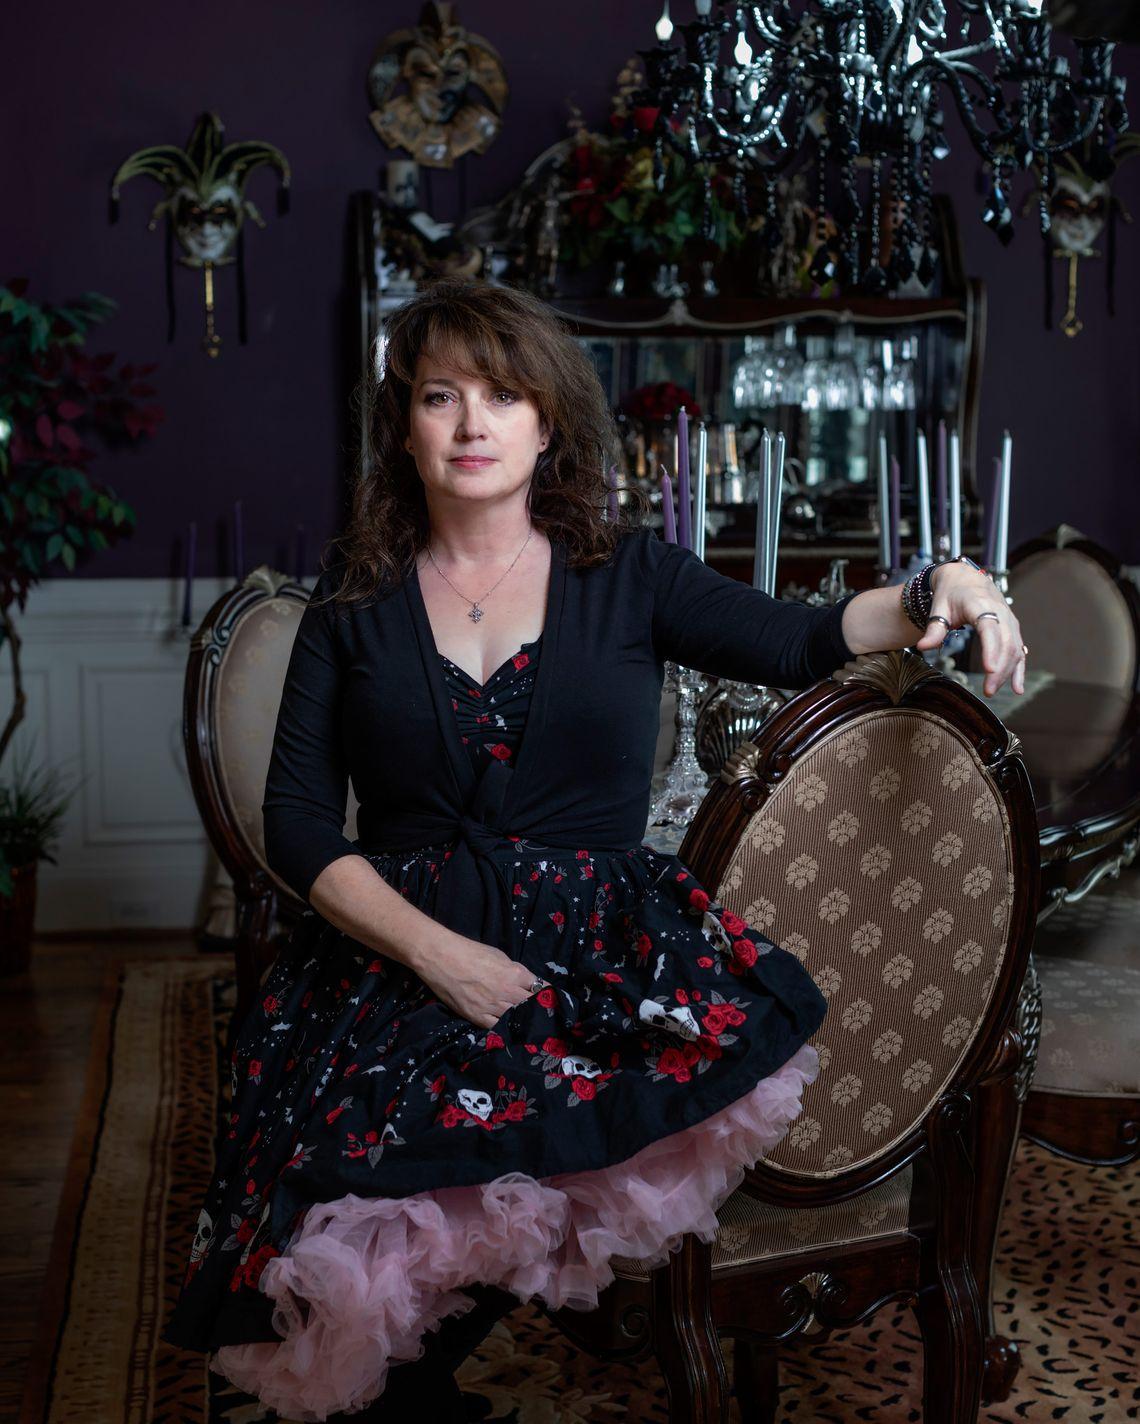 Sherrilyn Kenyon Said Her Husband Poisoned Her  Was It True?